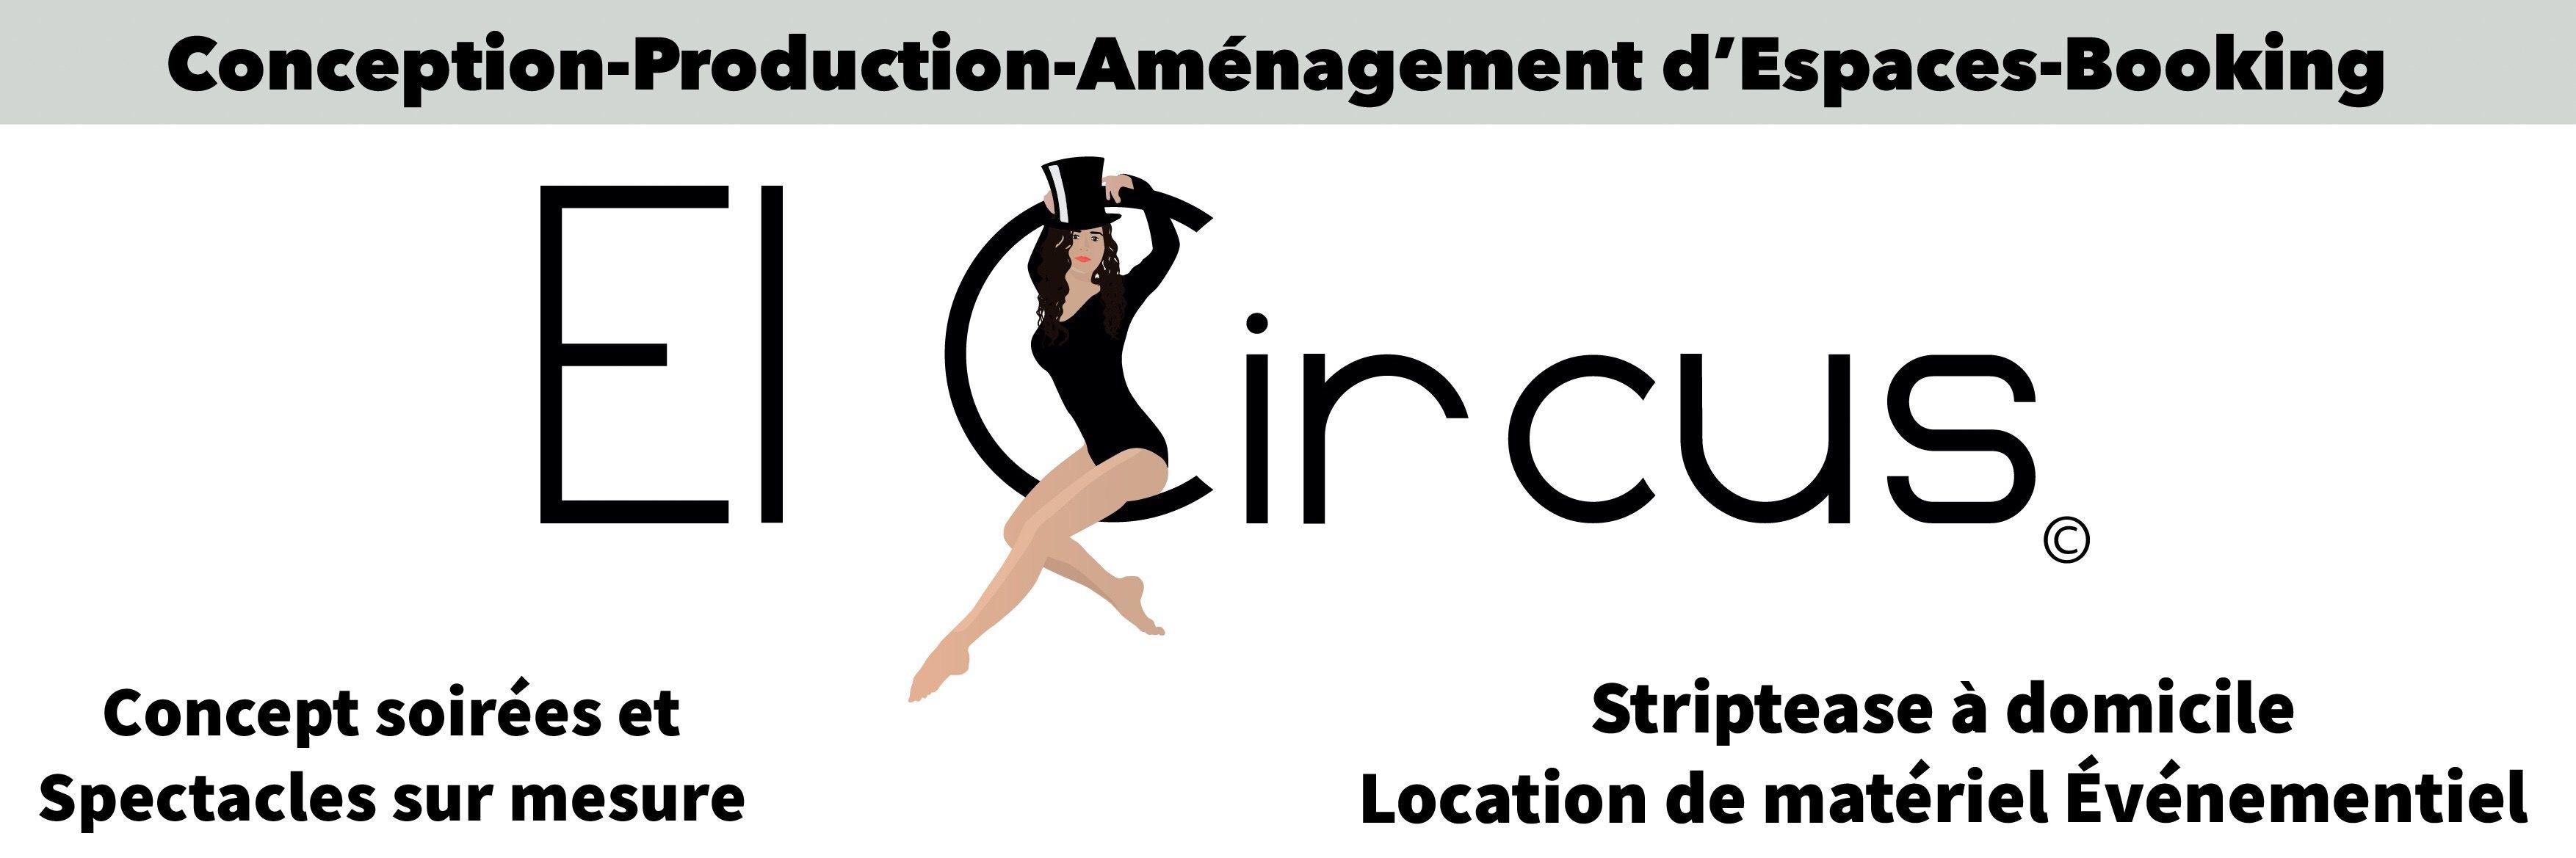 elcircus, el-circus, concept, événementiel